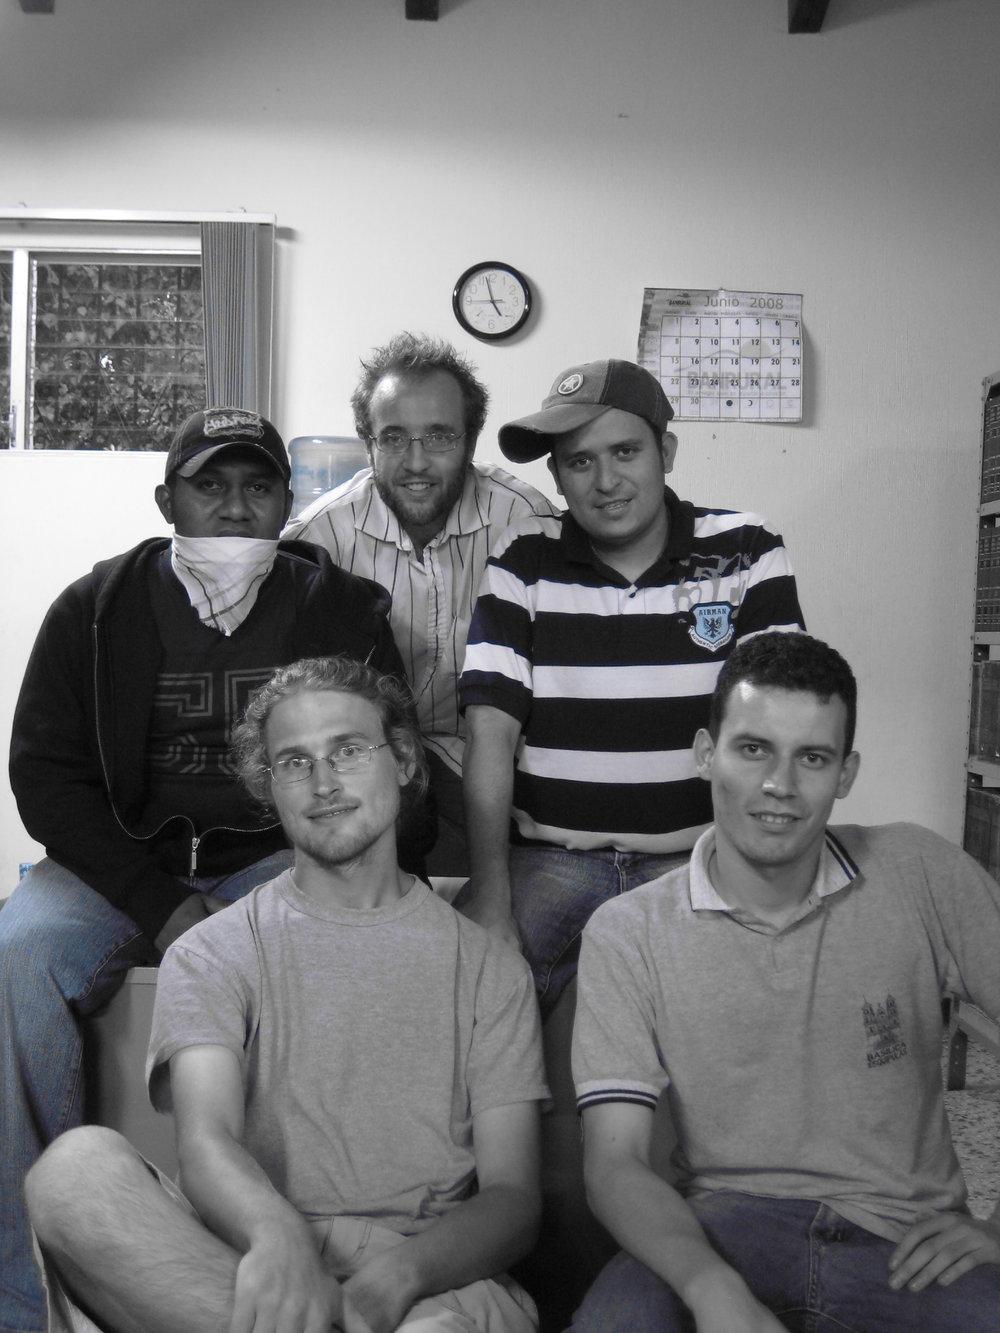 BVC Esquipulas 2007 Michael Anderson and Liam Sperl.JPG